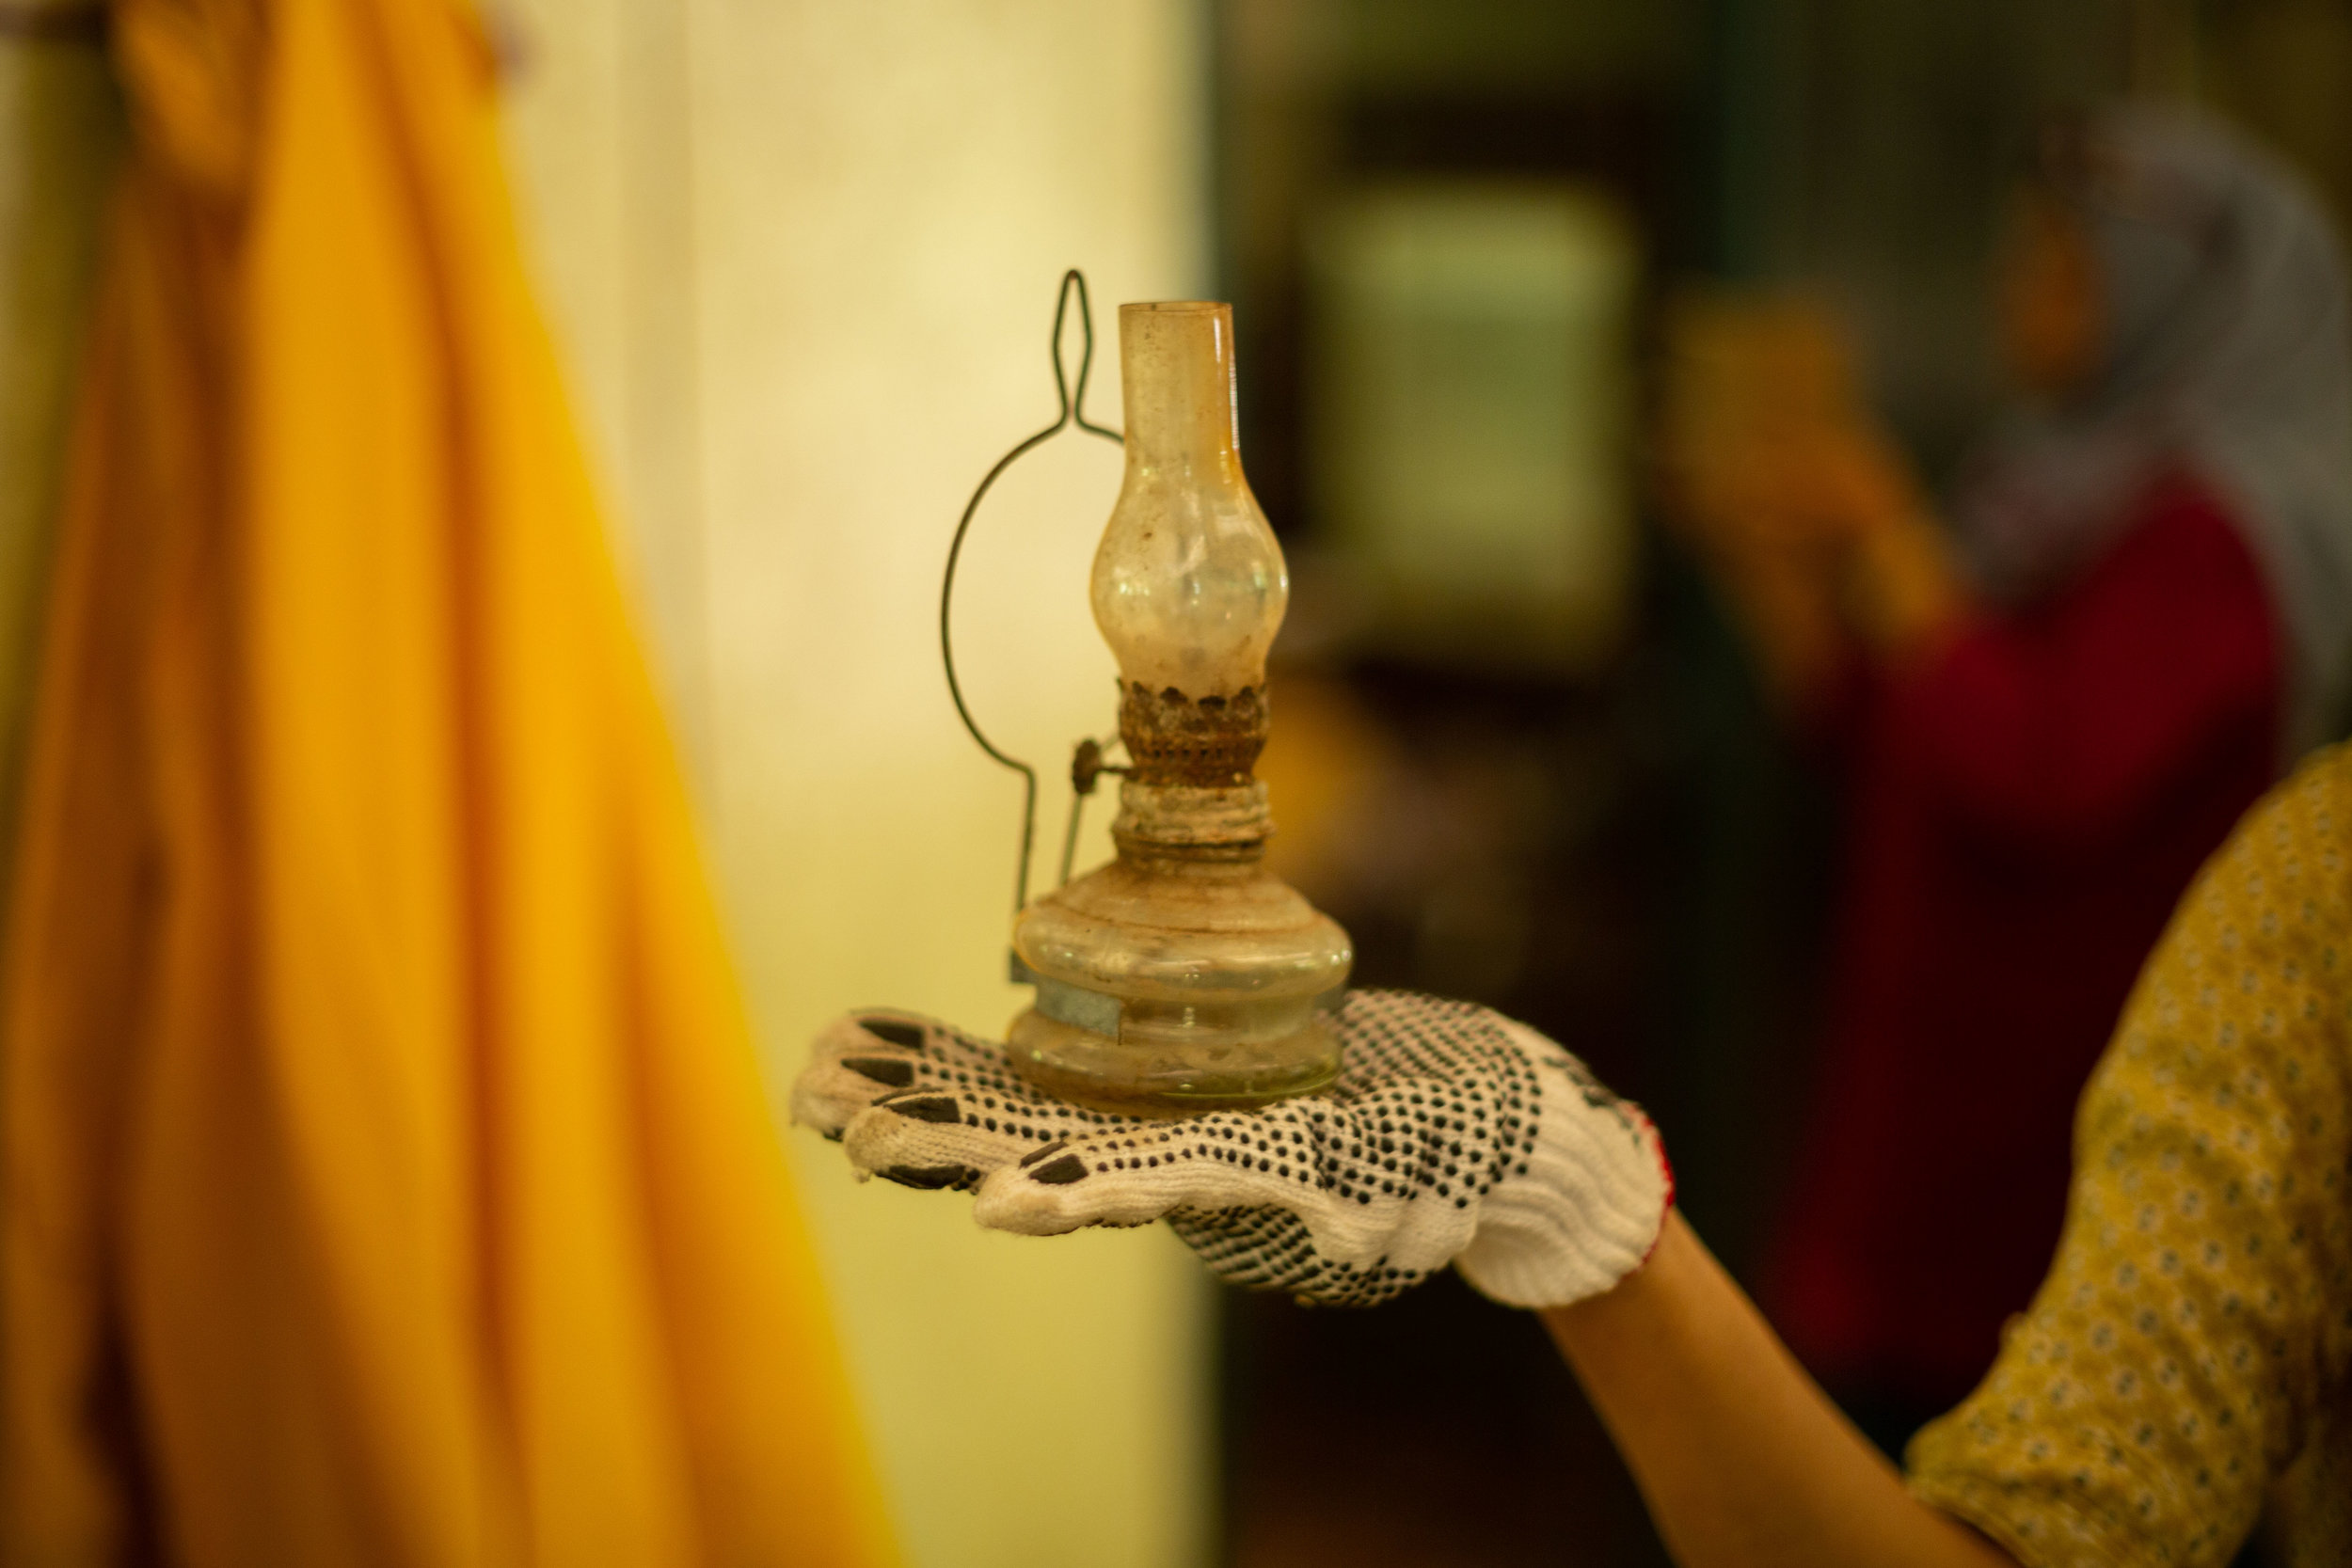 Cik Nora holding a 19th century kerosene lamp